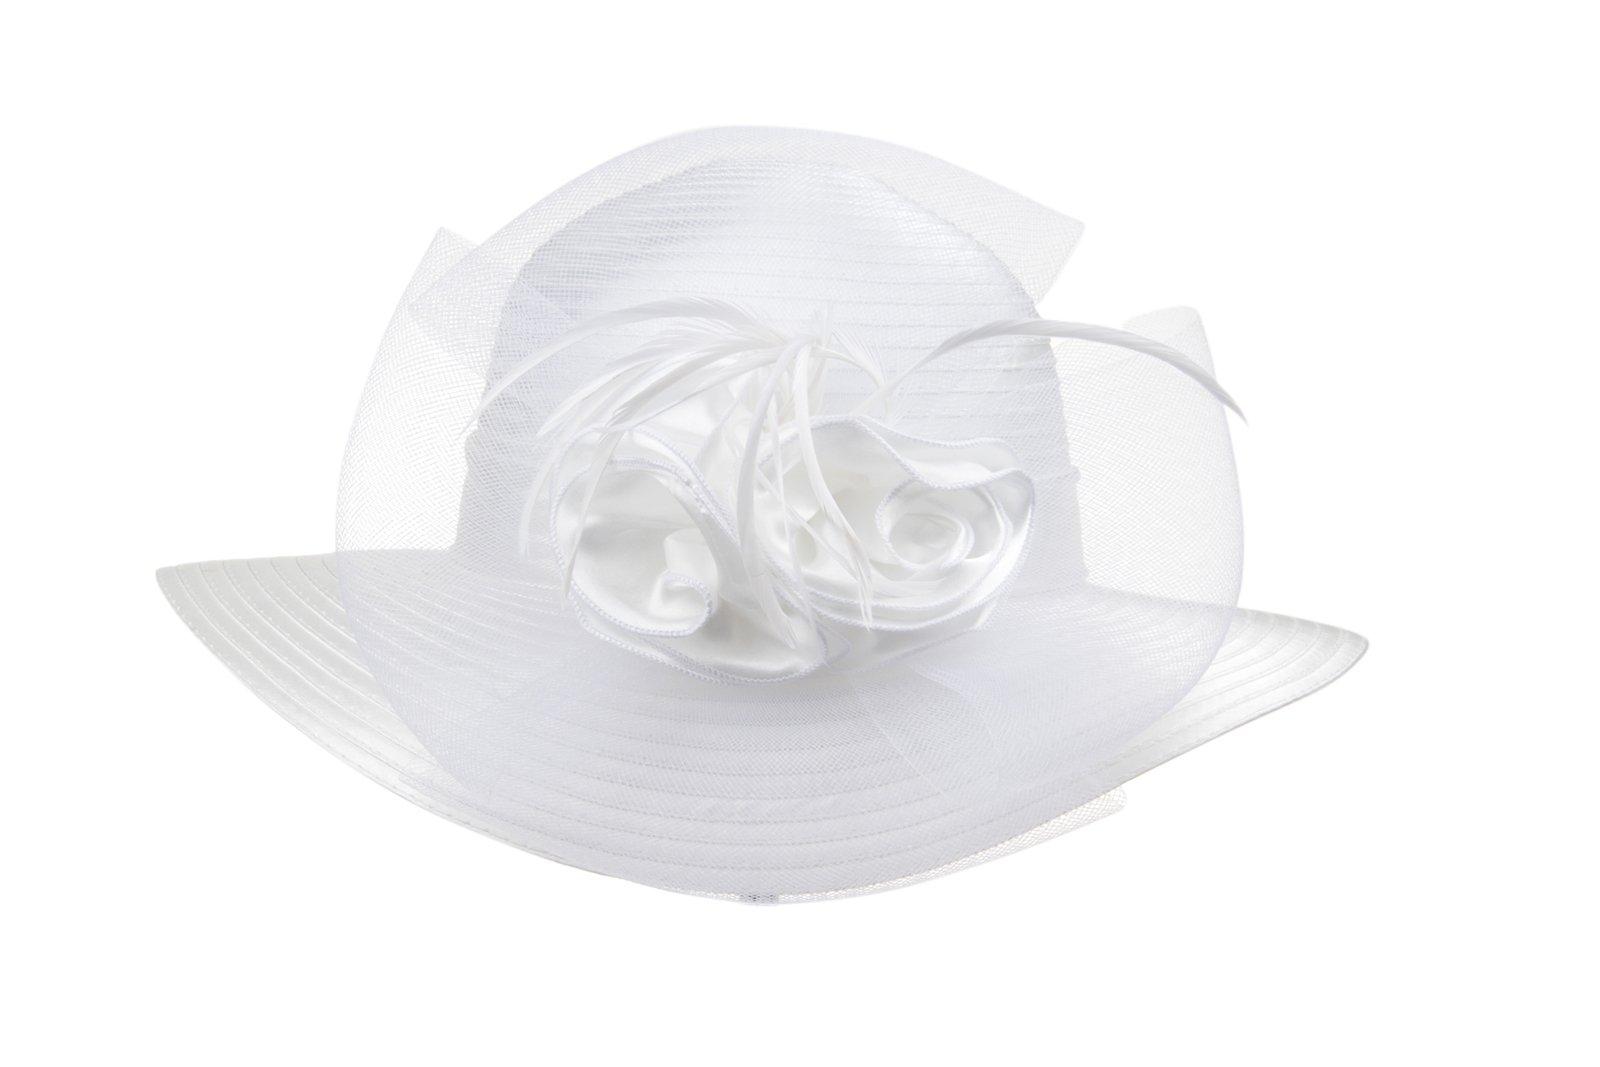 Prefe Lady's Kentucky Derby Dress Church Cloche Hat Bow Bucket Wedding Bowler Hats (White, One Size)